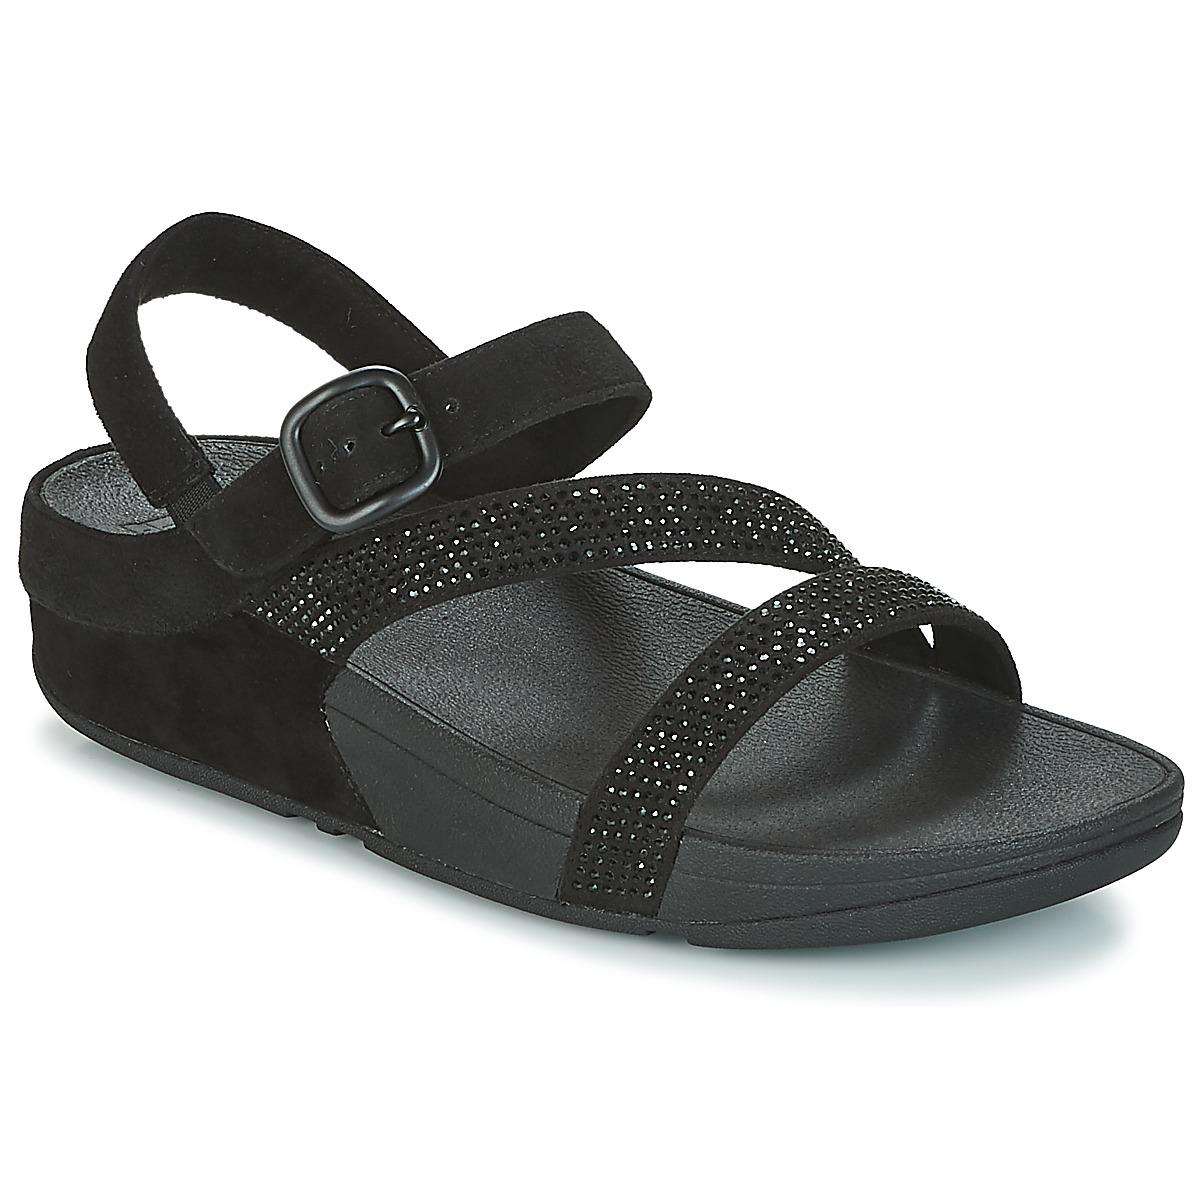 3be34990d Fitflop Slinky Rokkit Women s Sandals In Black in Black - Save 18 ...